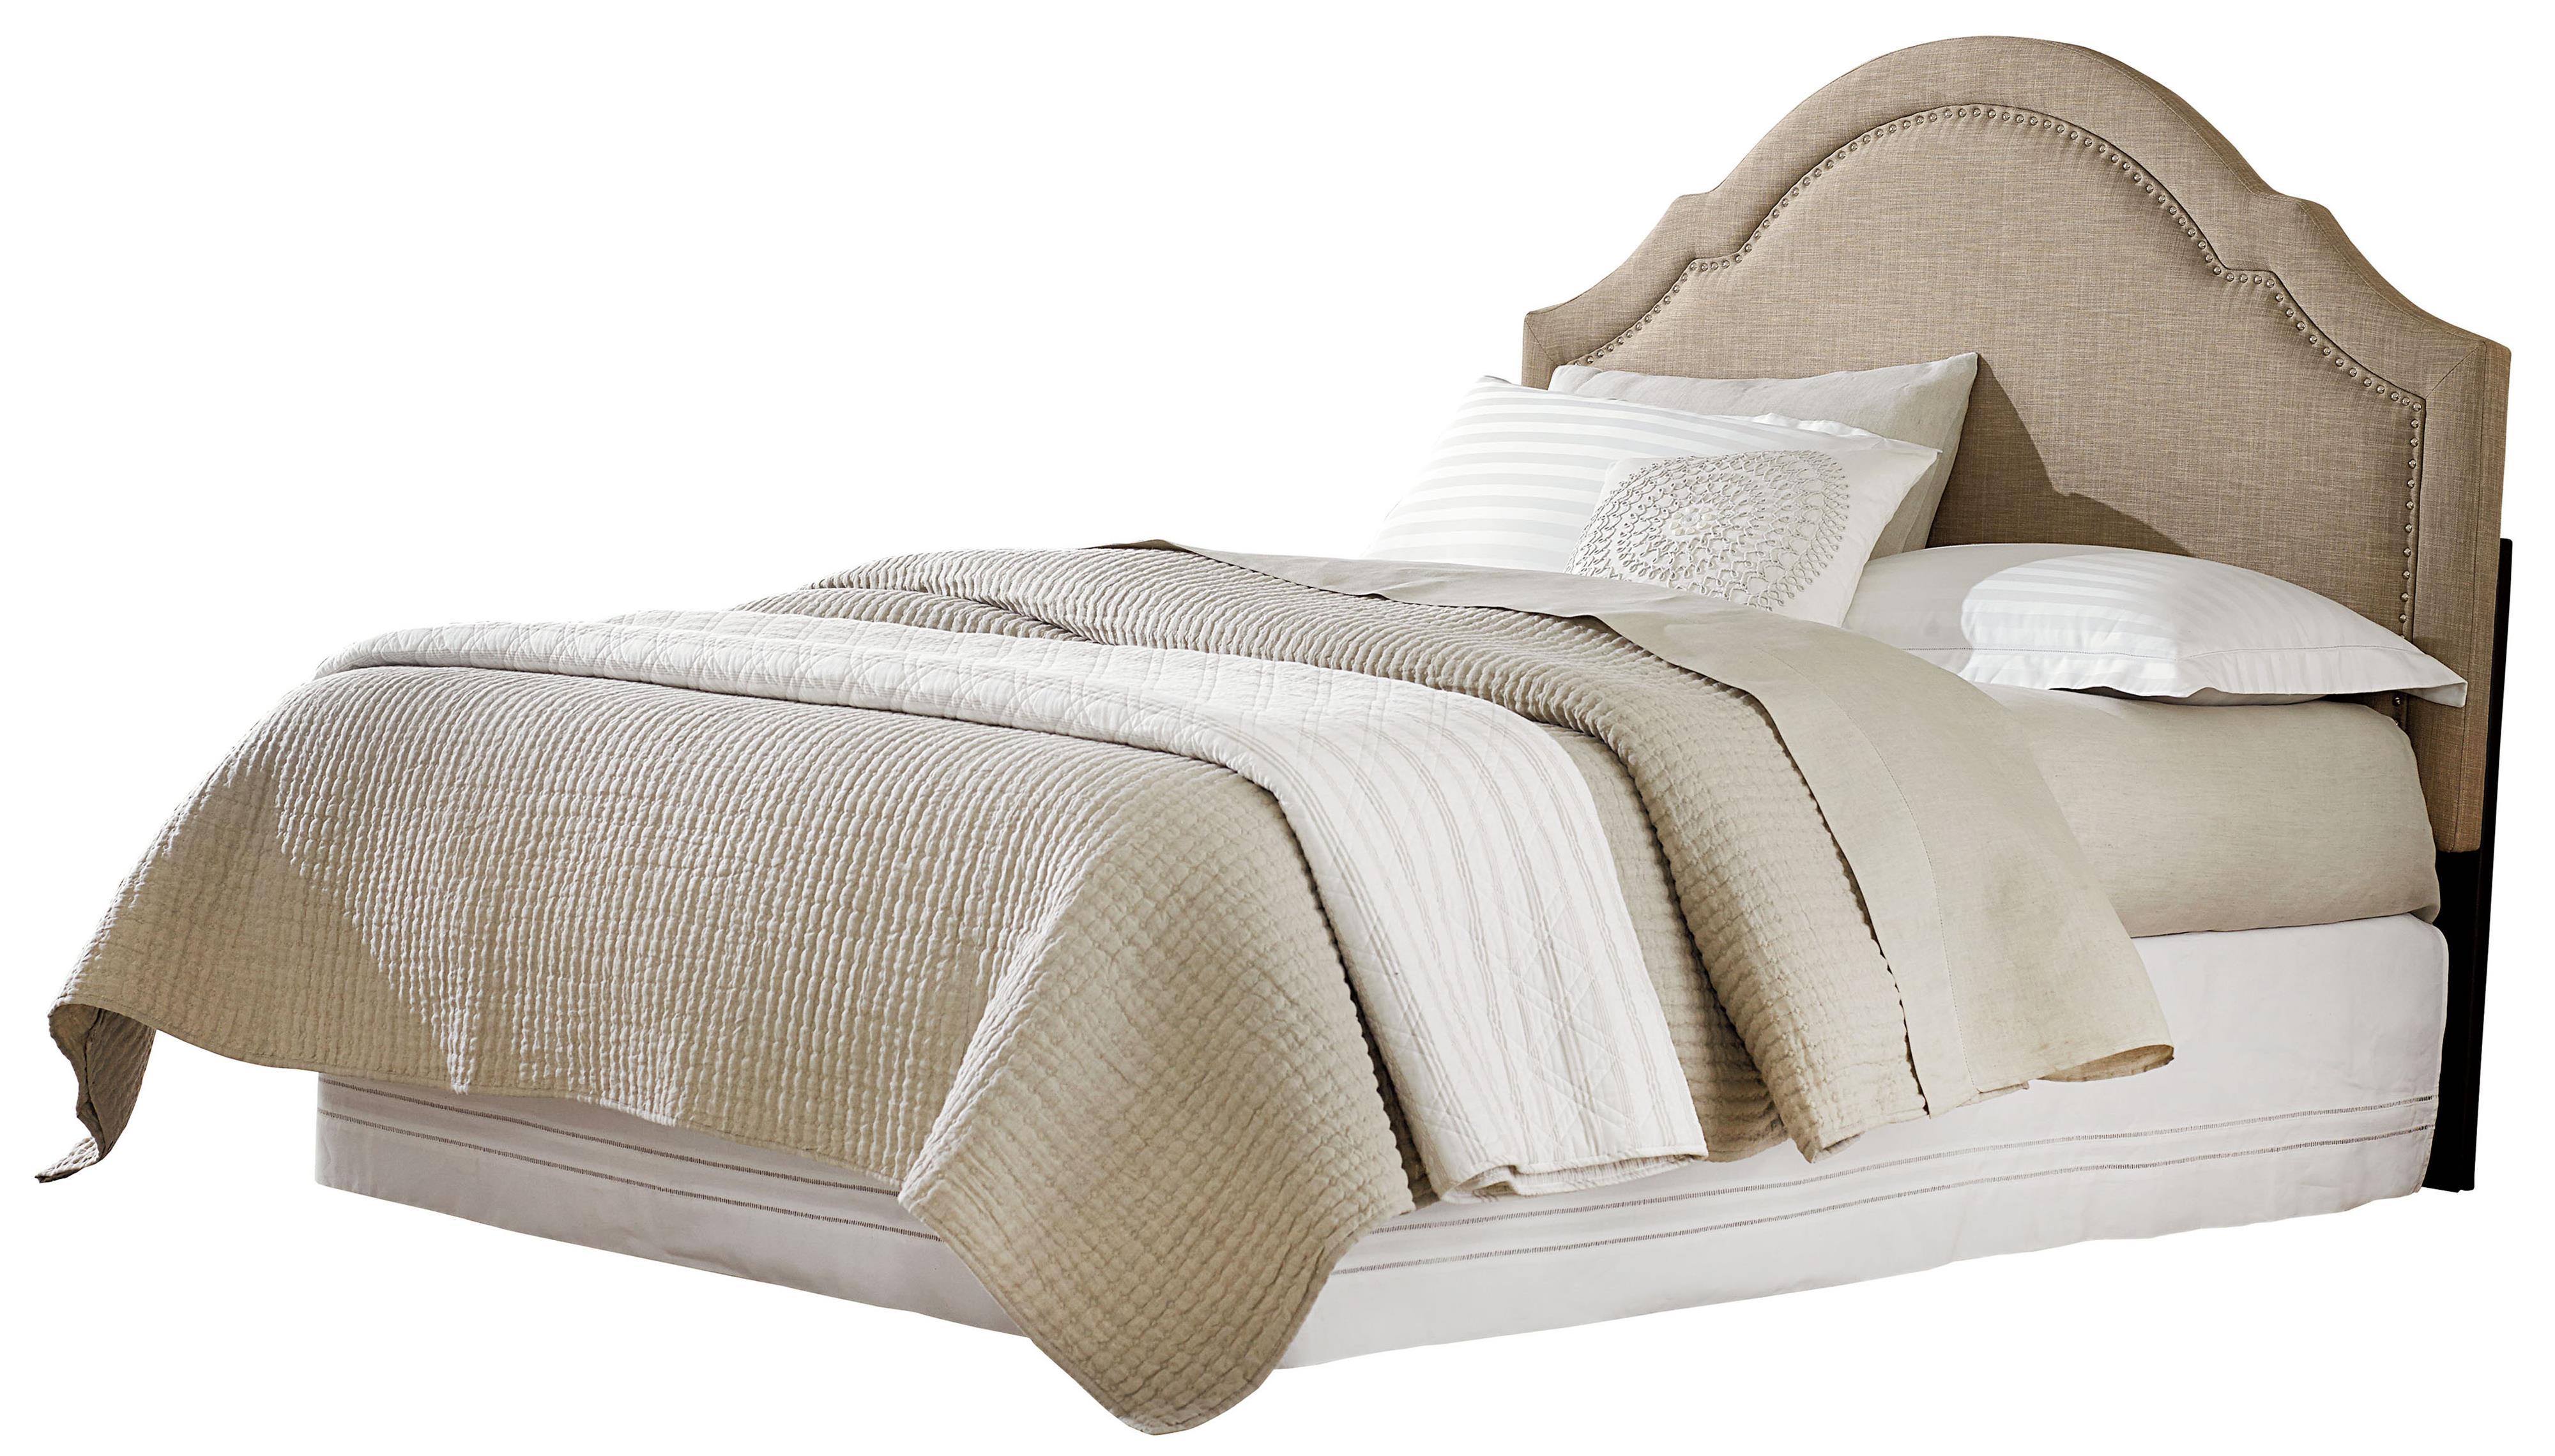 Standard Furniture Simplicity Full Headboard - Item Number: 81692